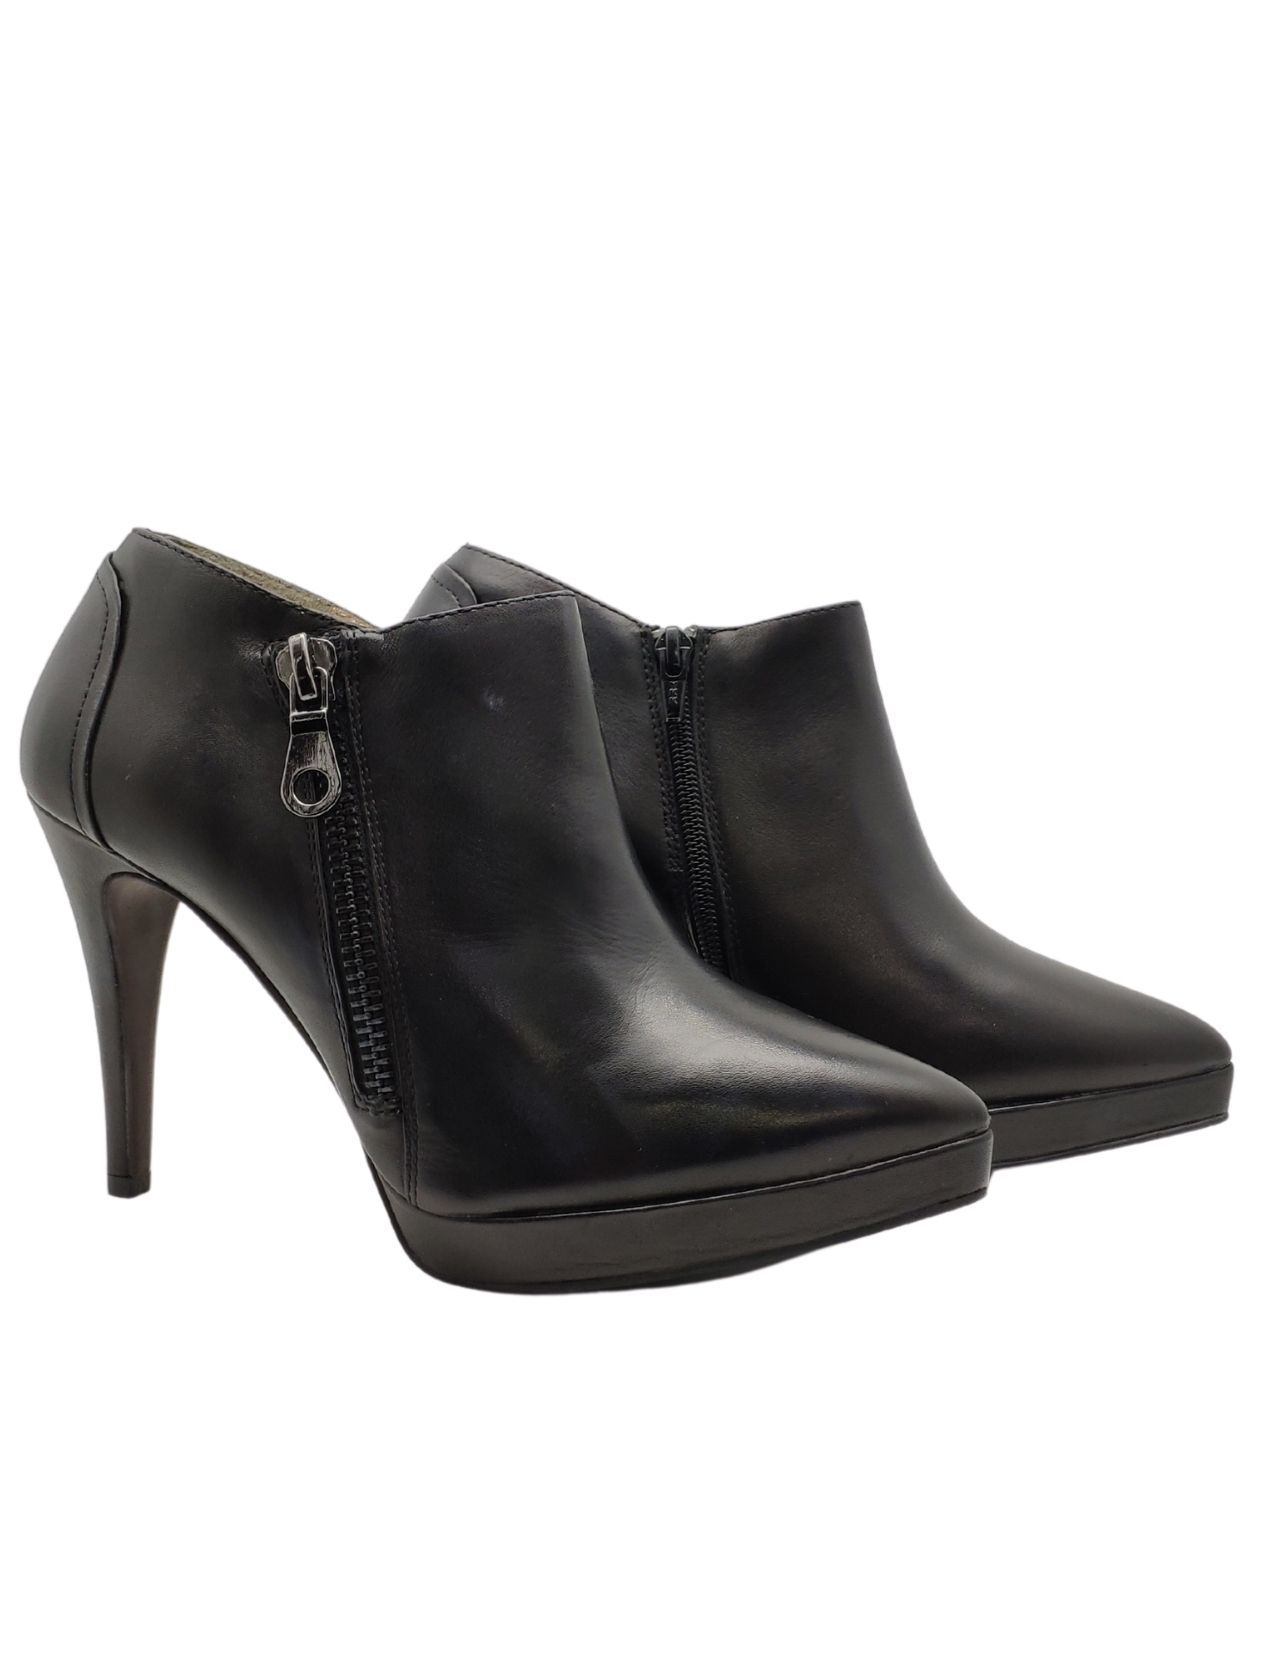 Ankle Boot Woman Bruno Premi | Ankle Boots | ART10F5201NERO